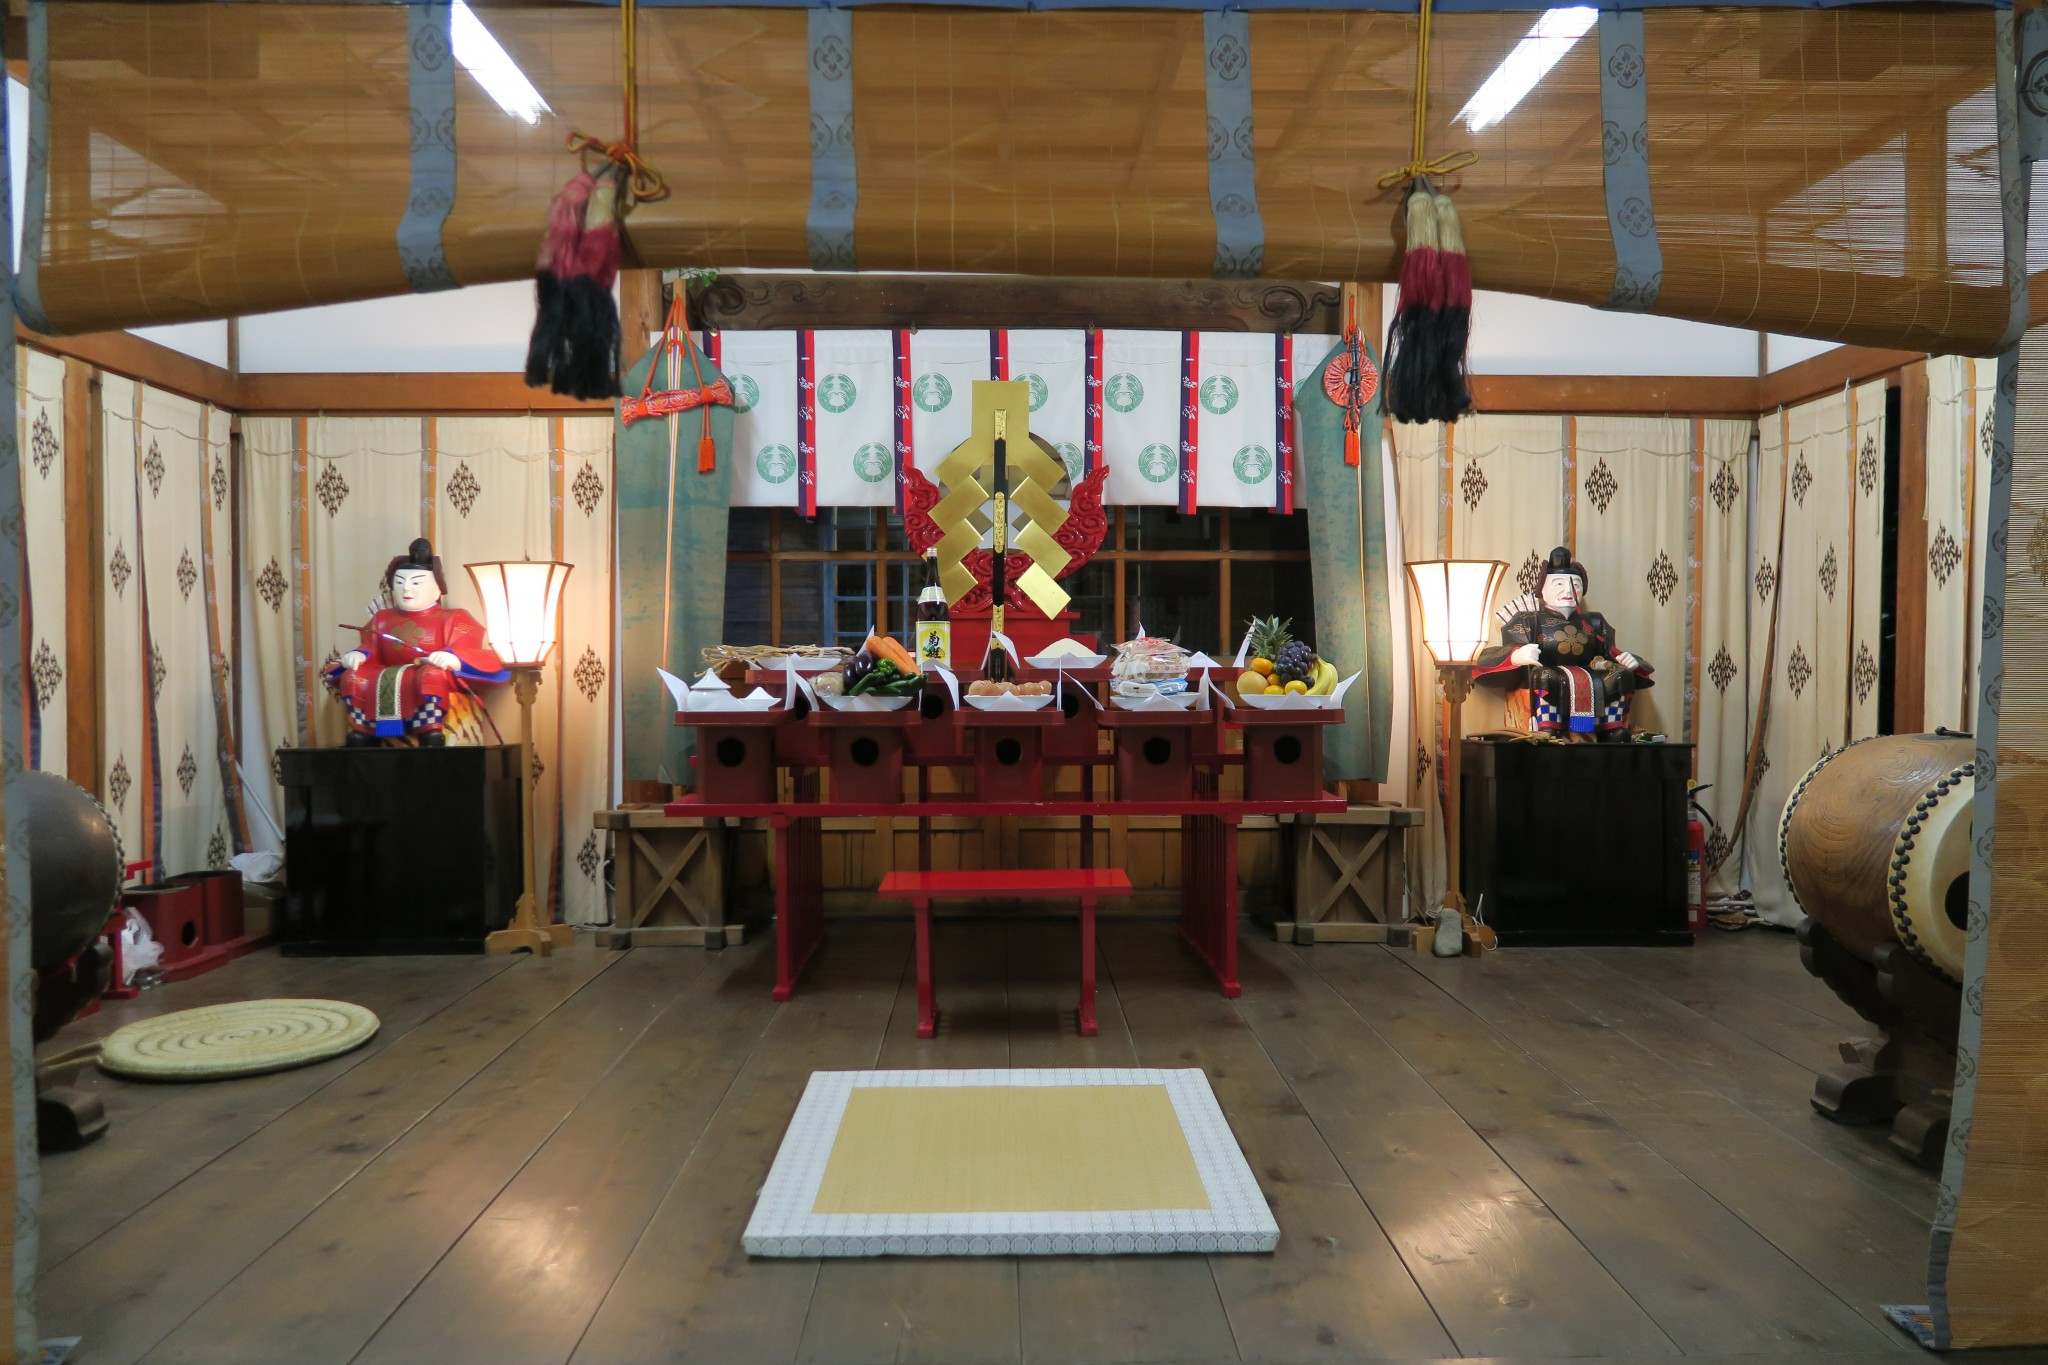 平成27年荒川神社秋祭り準備の様子